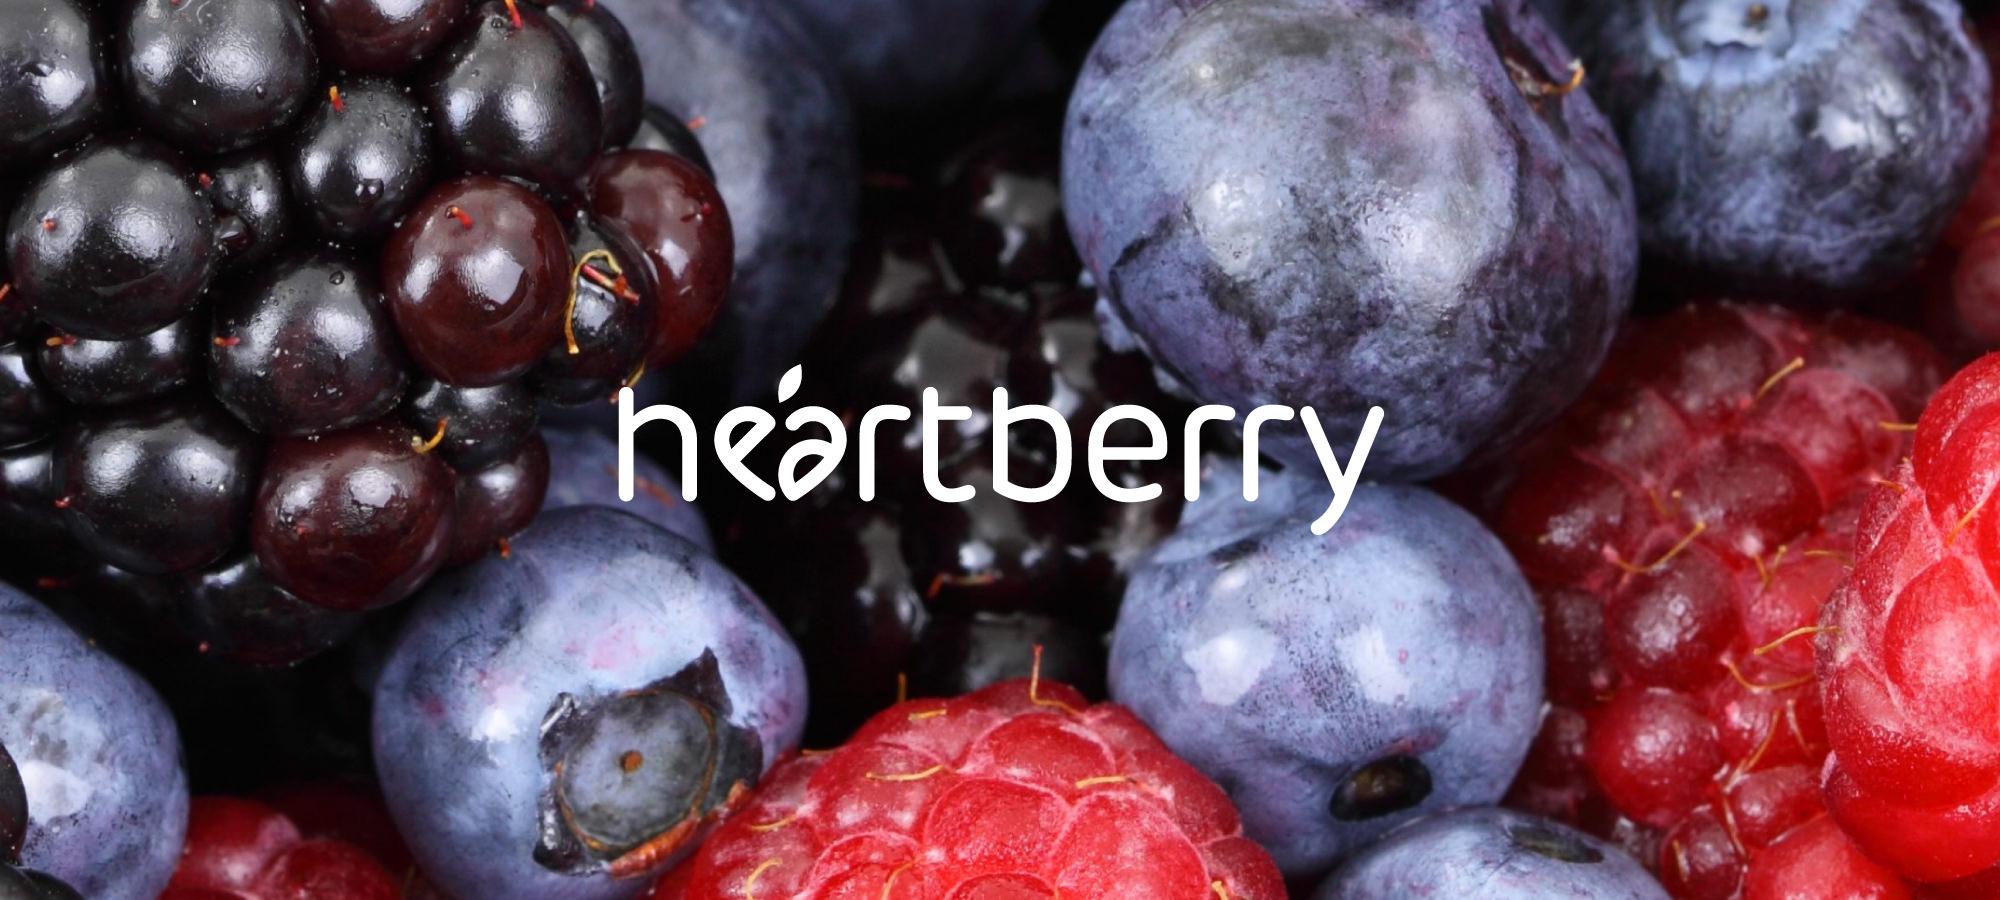 heartberry header-100